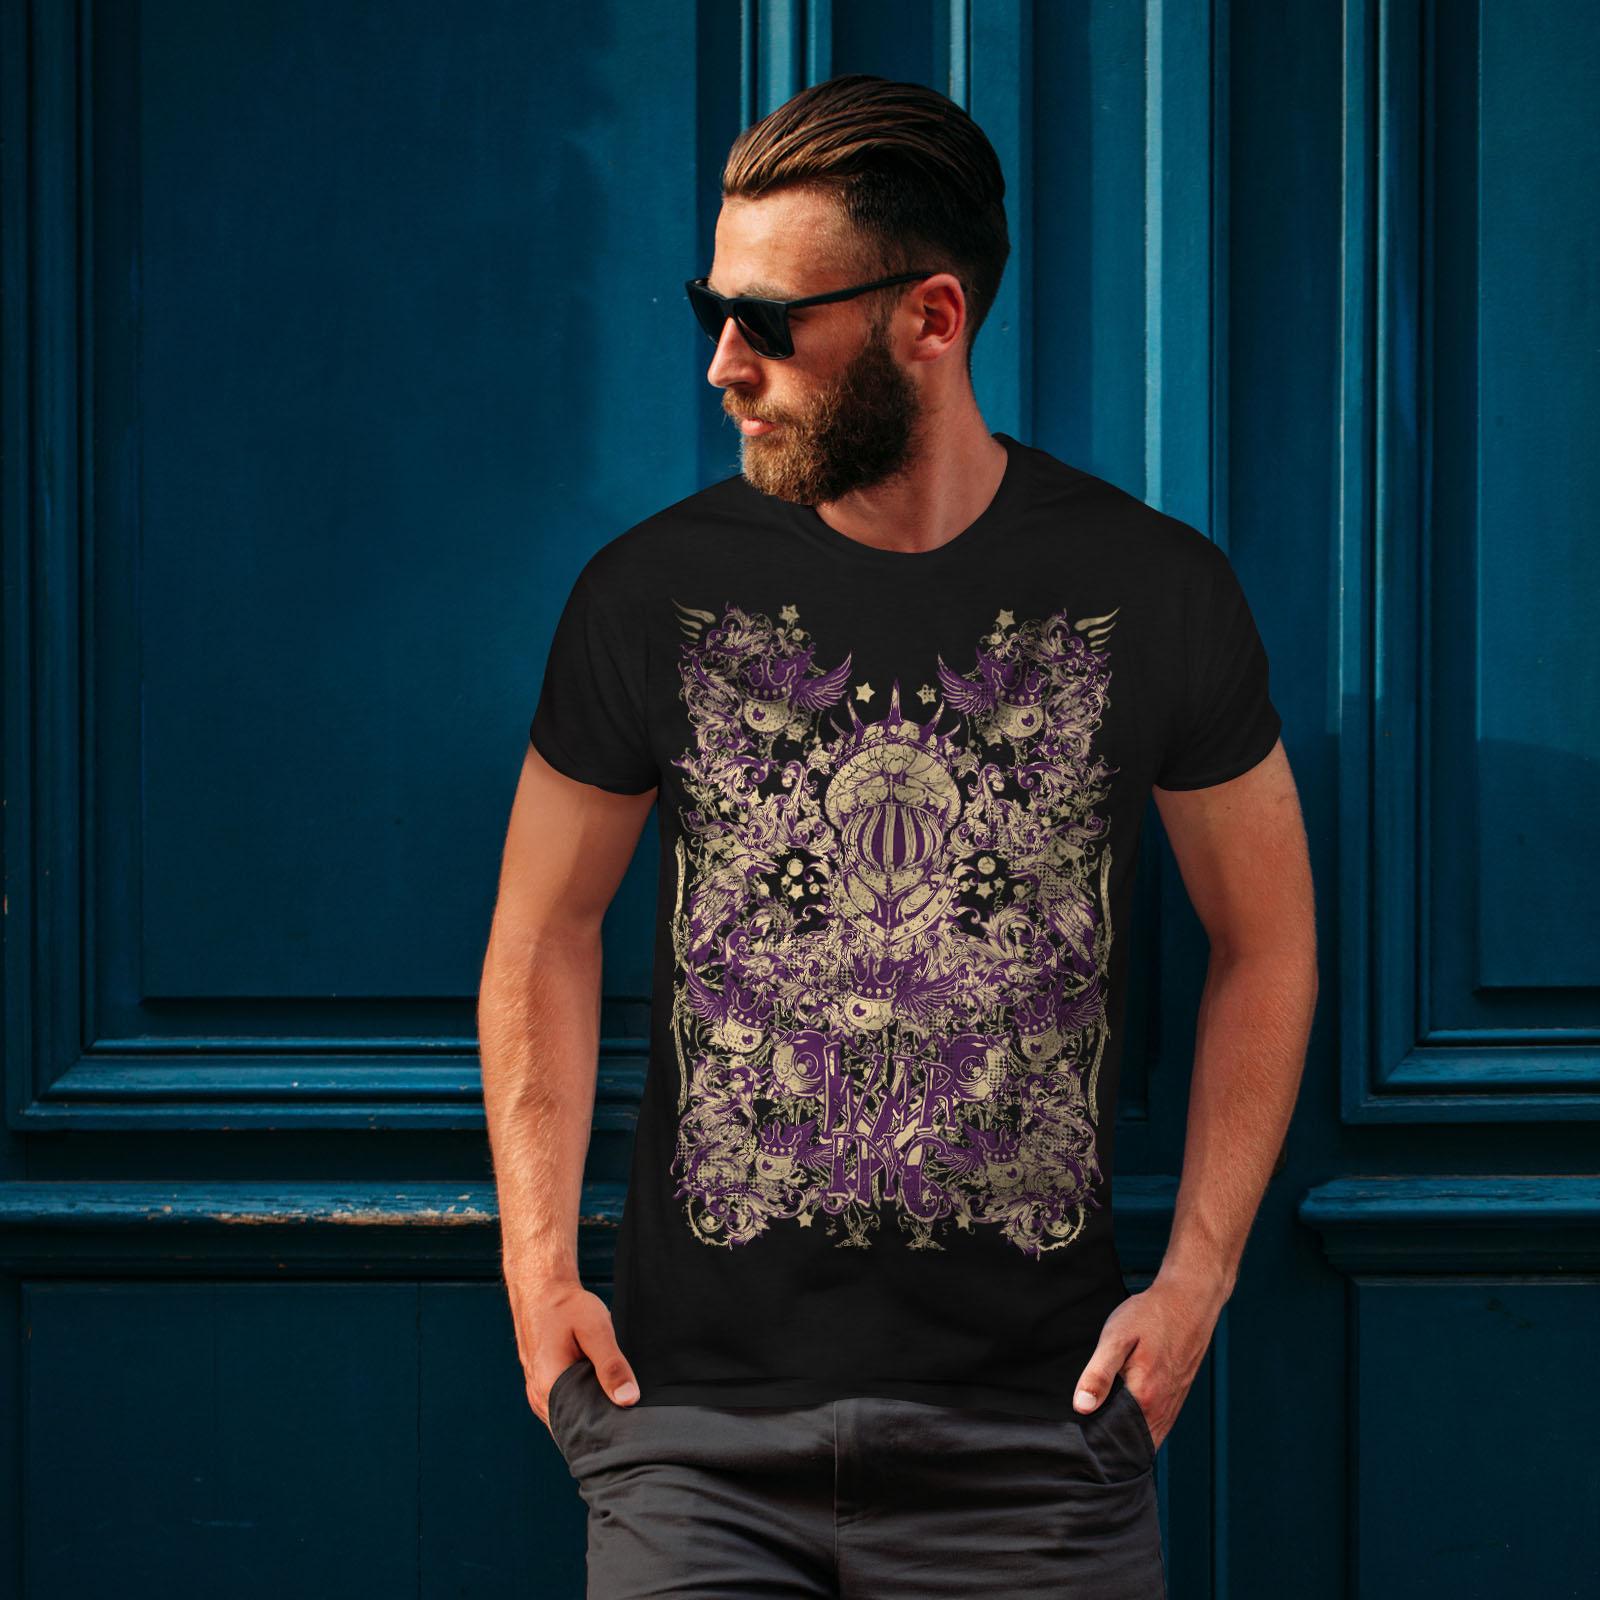 Wellcoda-War-Inc-Zombie-Mens-T-shirt-Monster-Graphic-Design-Printed-Tee thumbnail 4